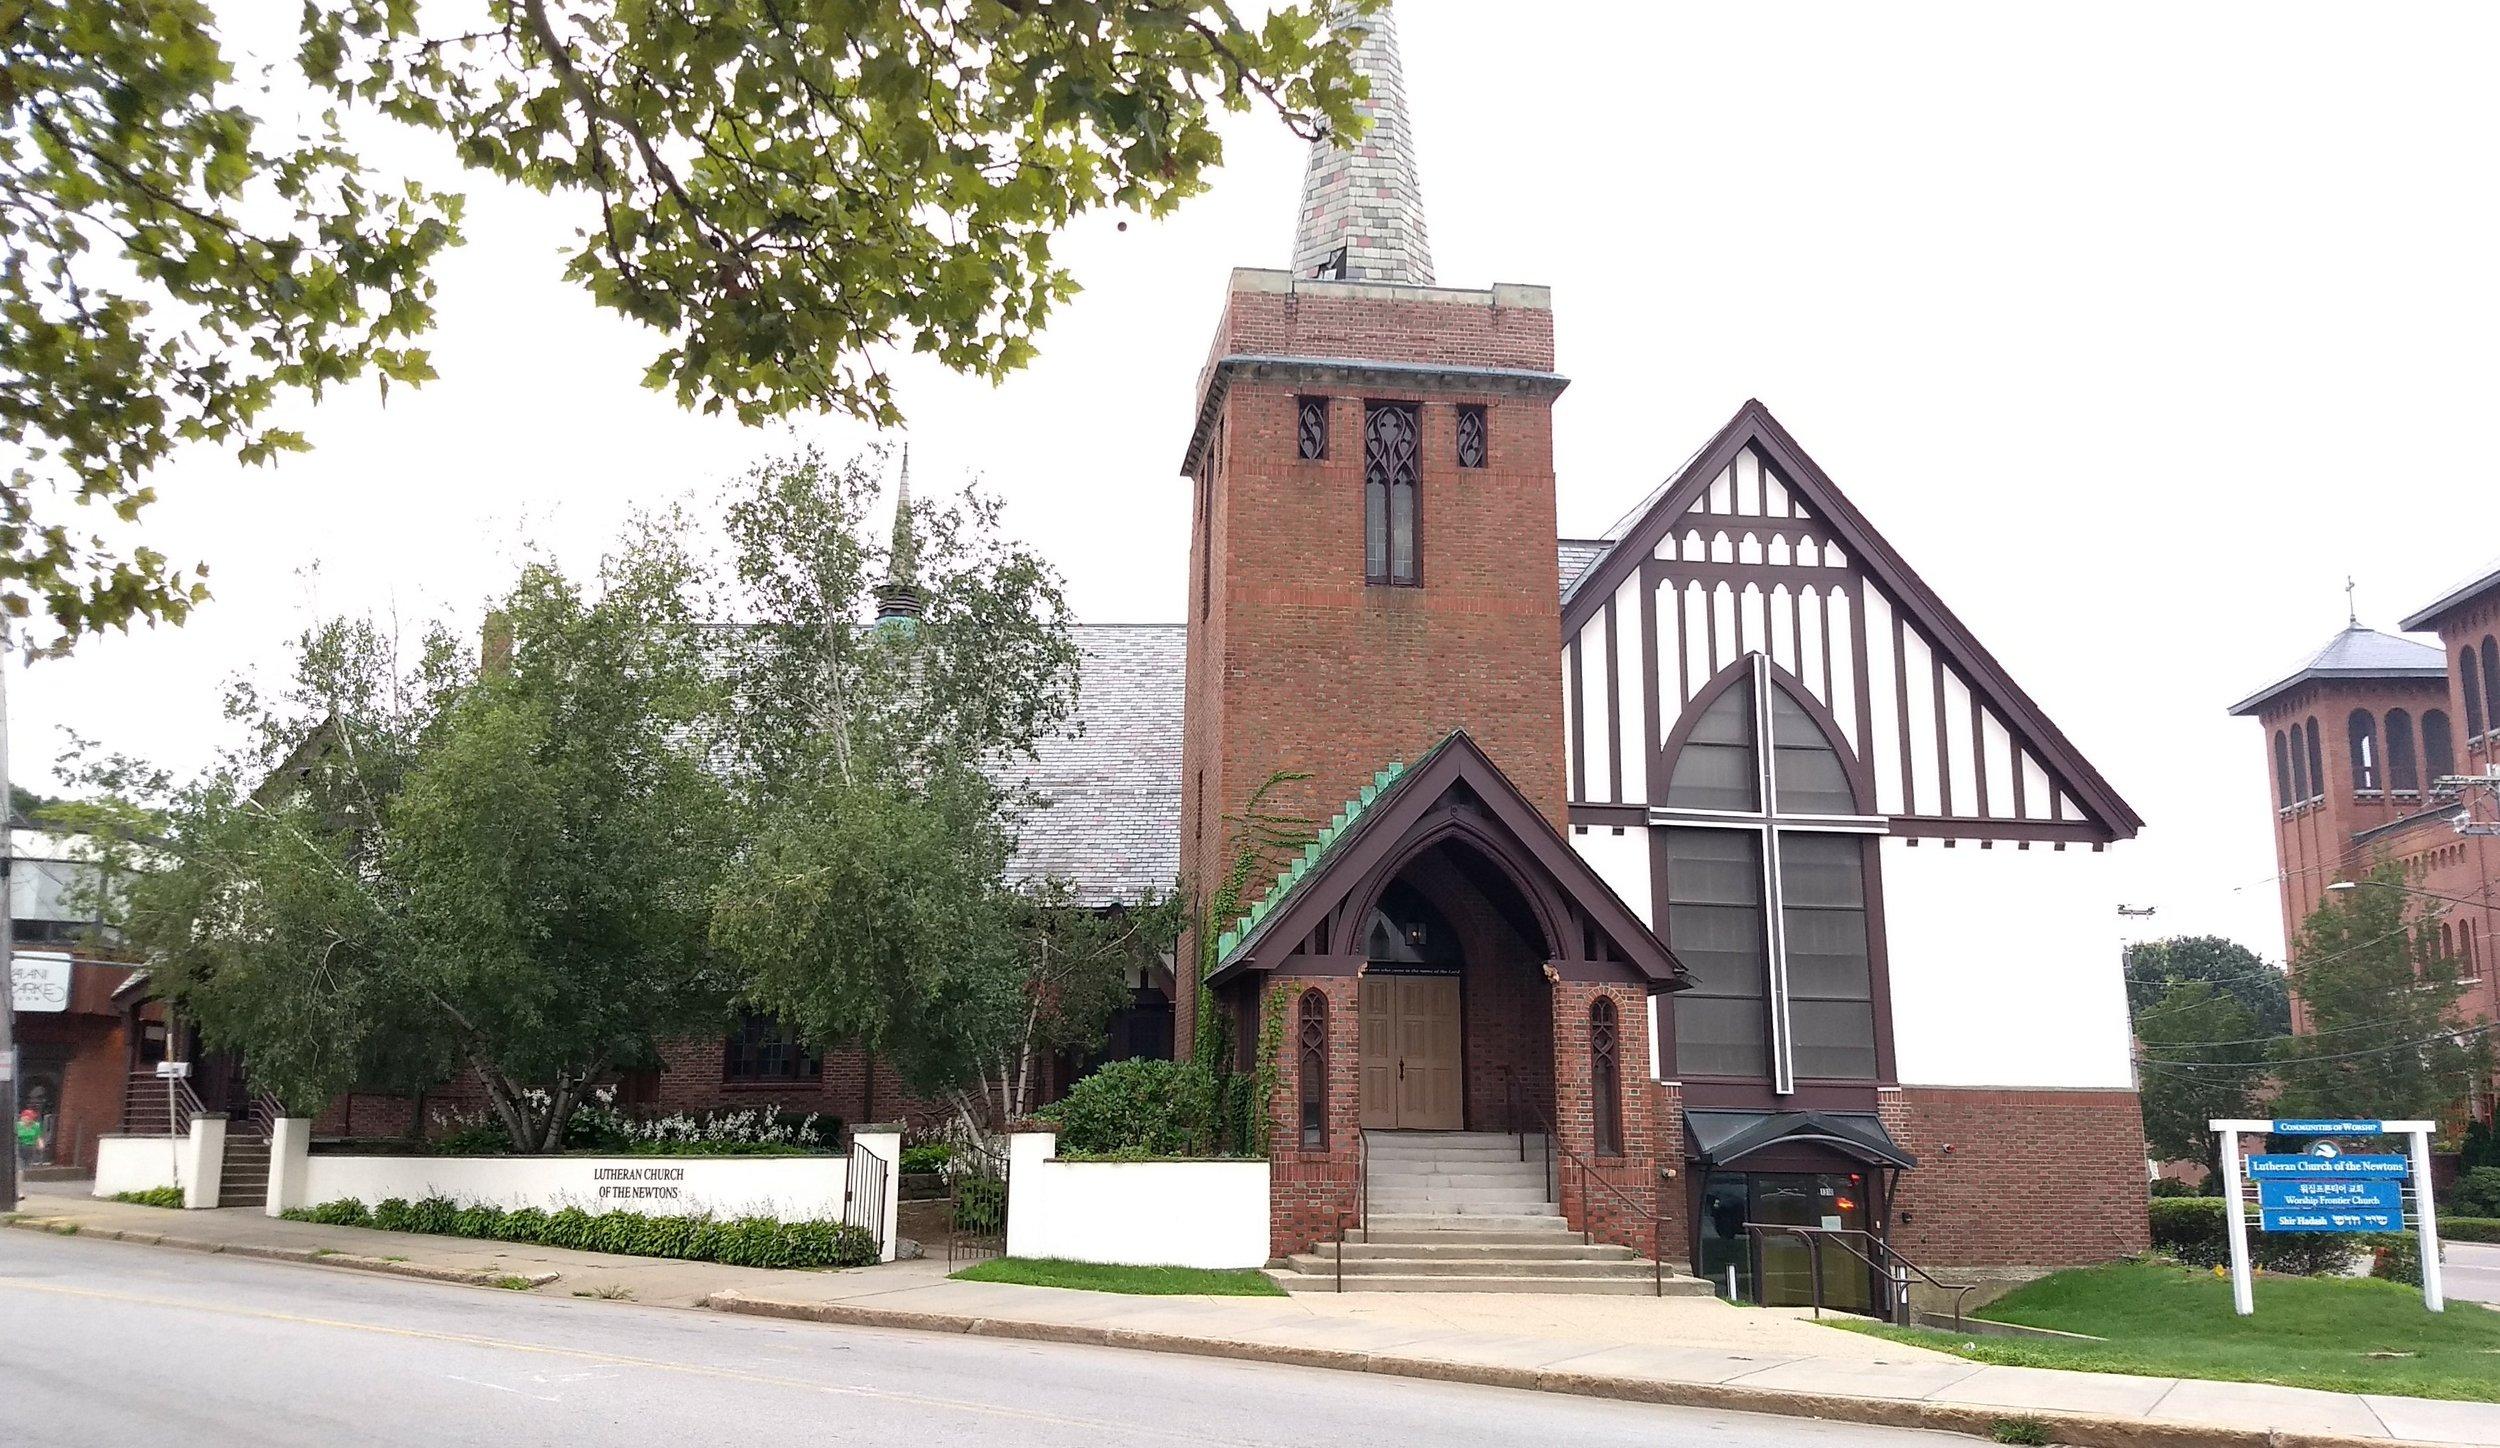 - Lutheran Church of the Newtons (LCN)루터란 교회의 건물에서 예배드리고 있습니다.*주일 주차창 안내와 건물 입구는 아래를 참고하세요